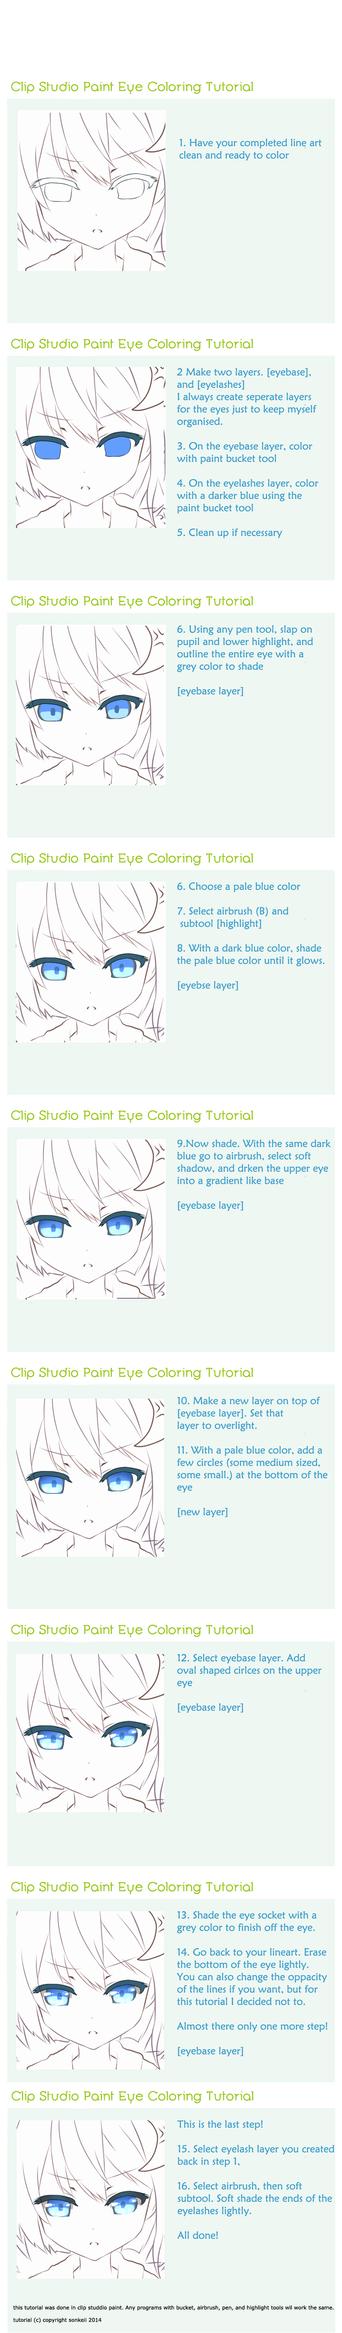 Clip Studio Paint Eye Tutorial by sonkeii